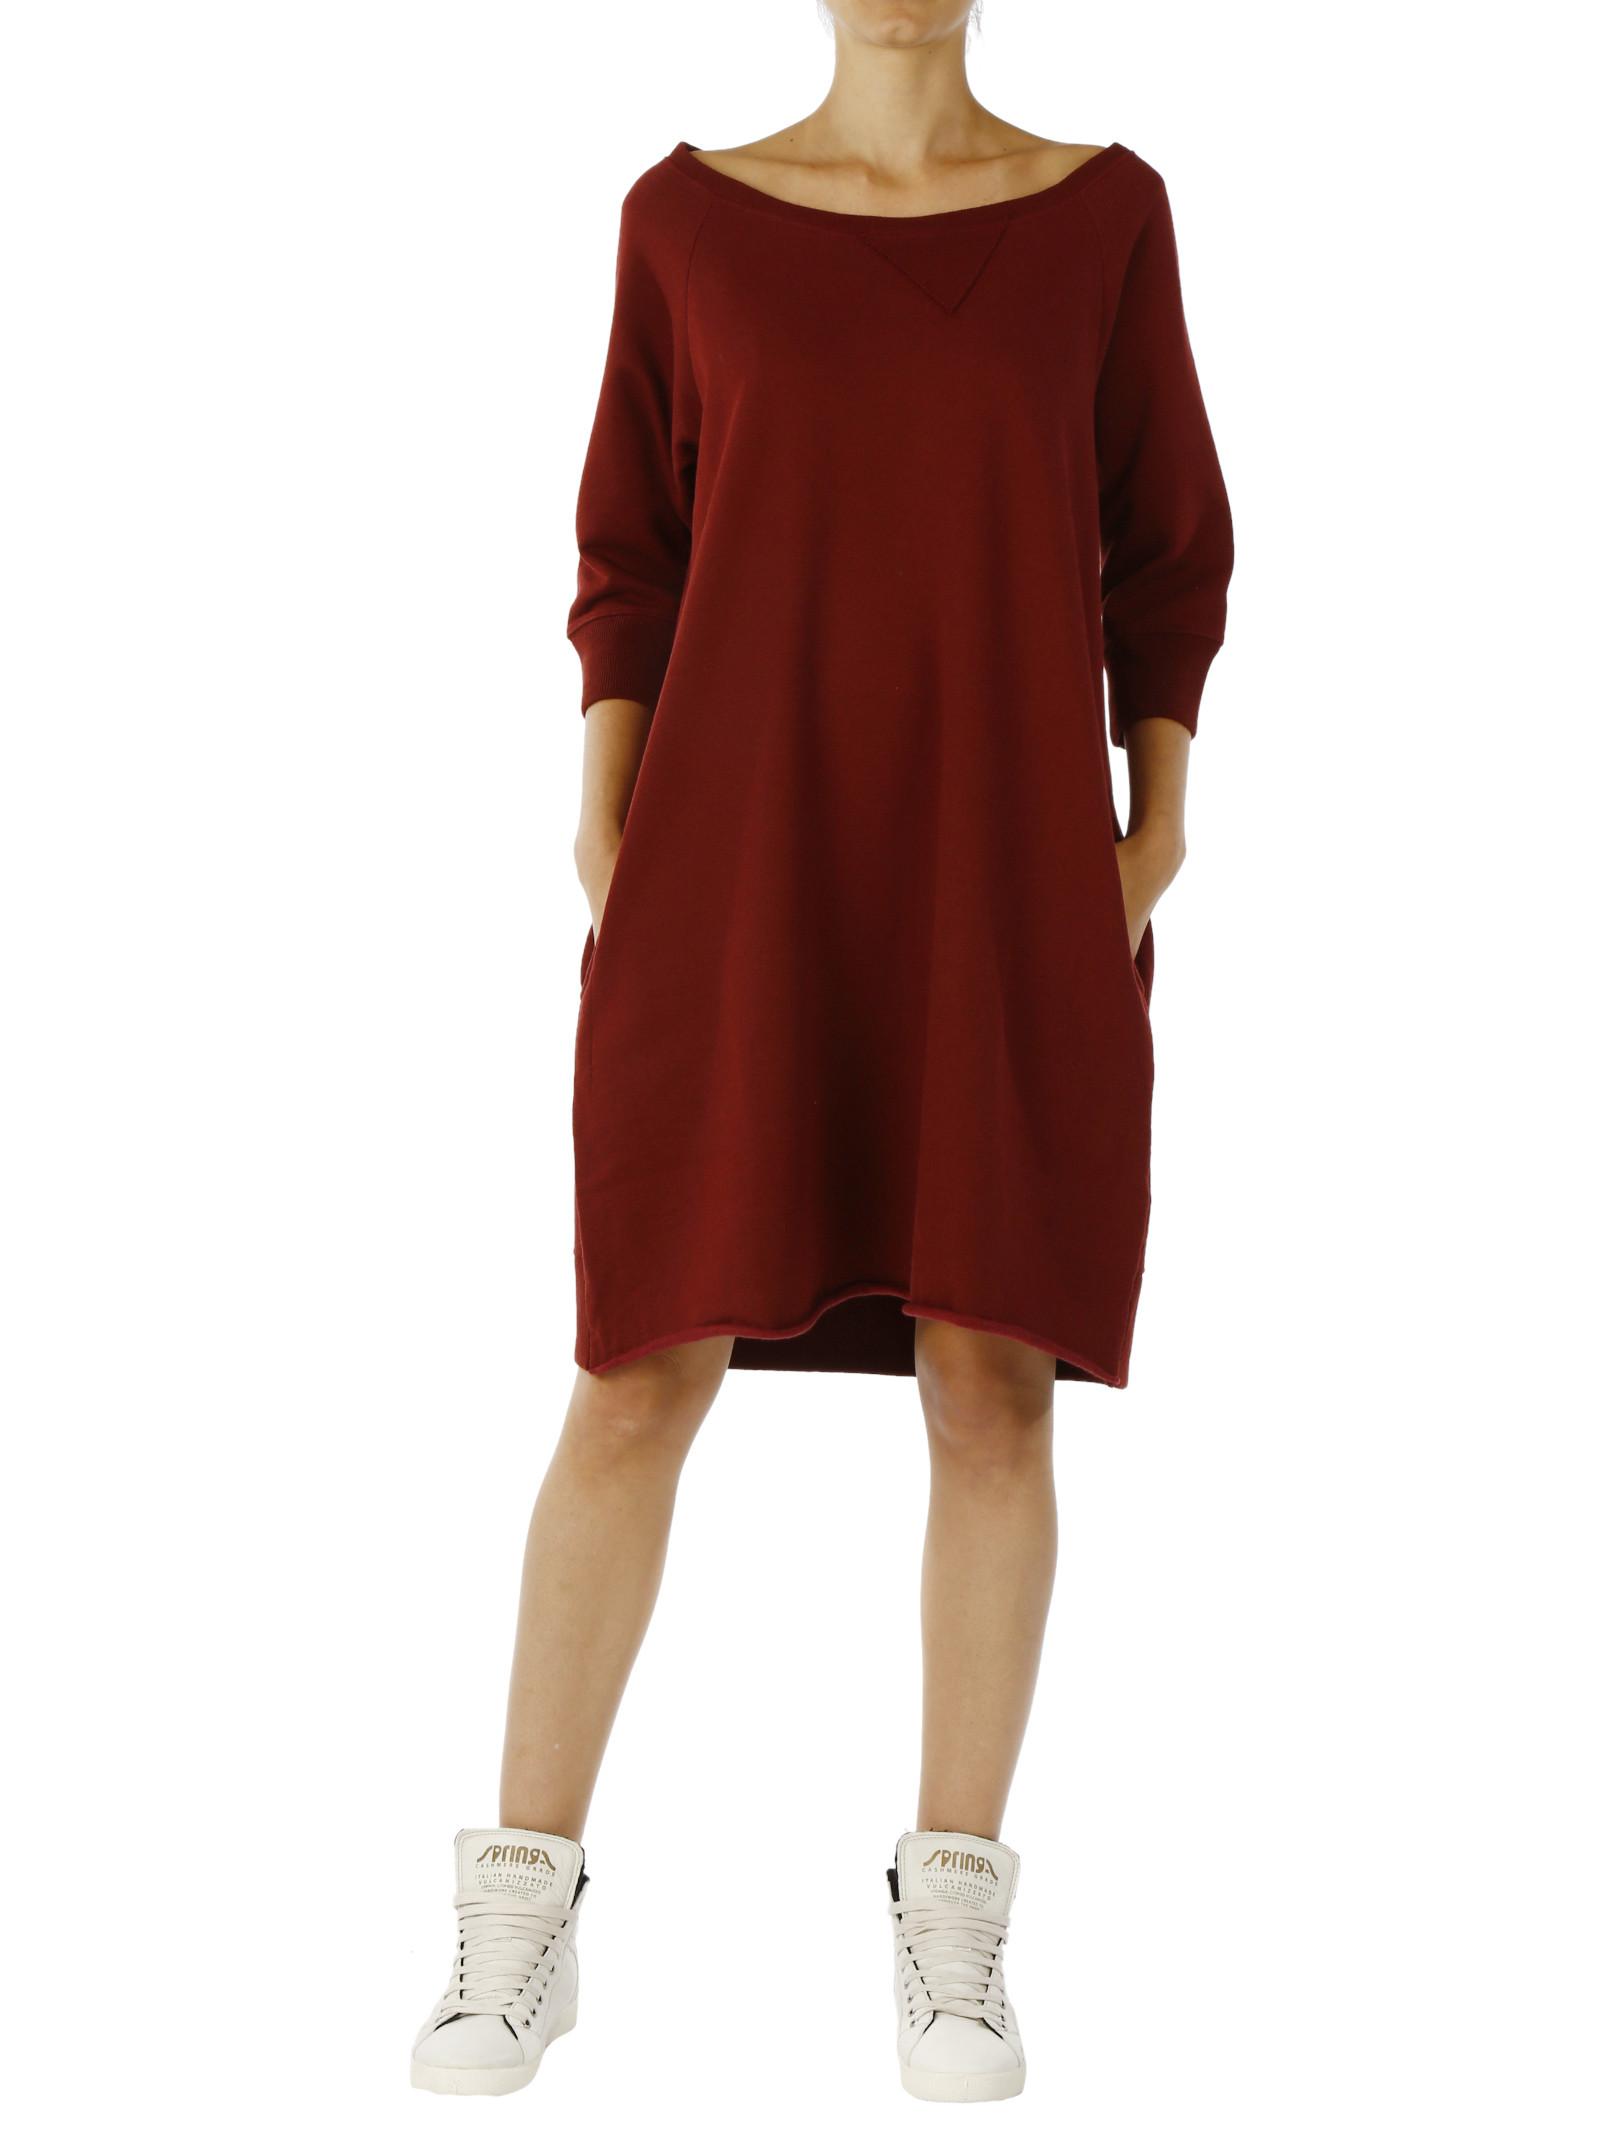 Altalana 100% Warm Cotton Sweatshirt Trapeze Dress